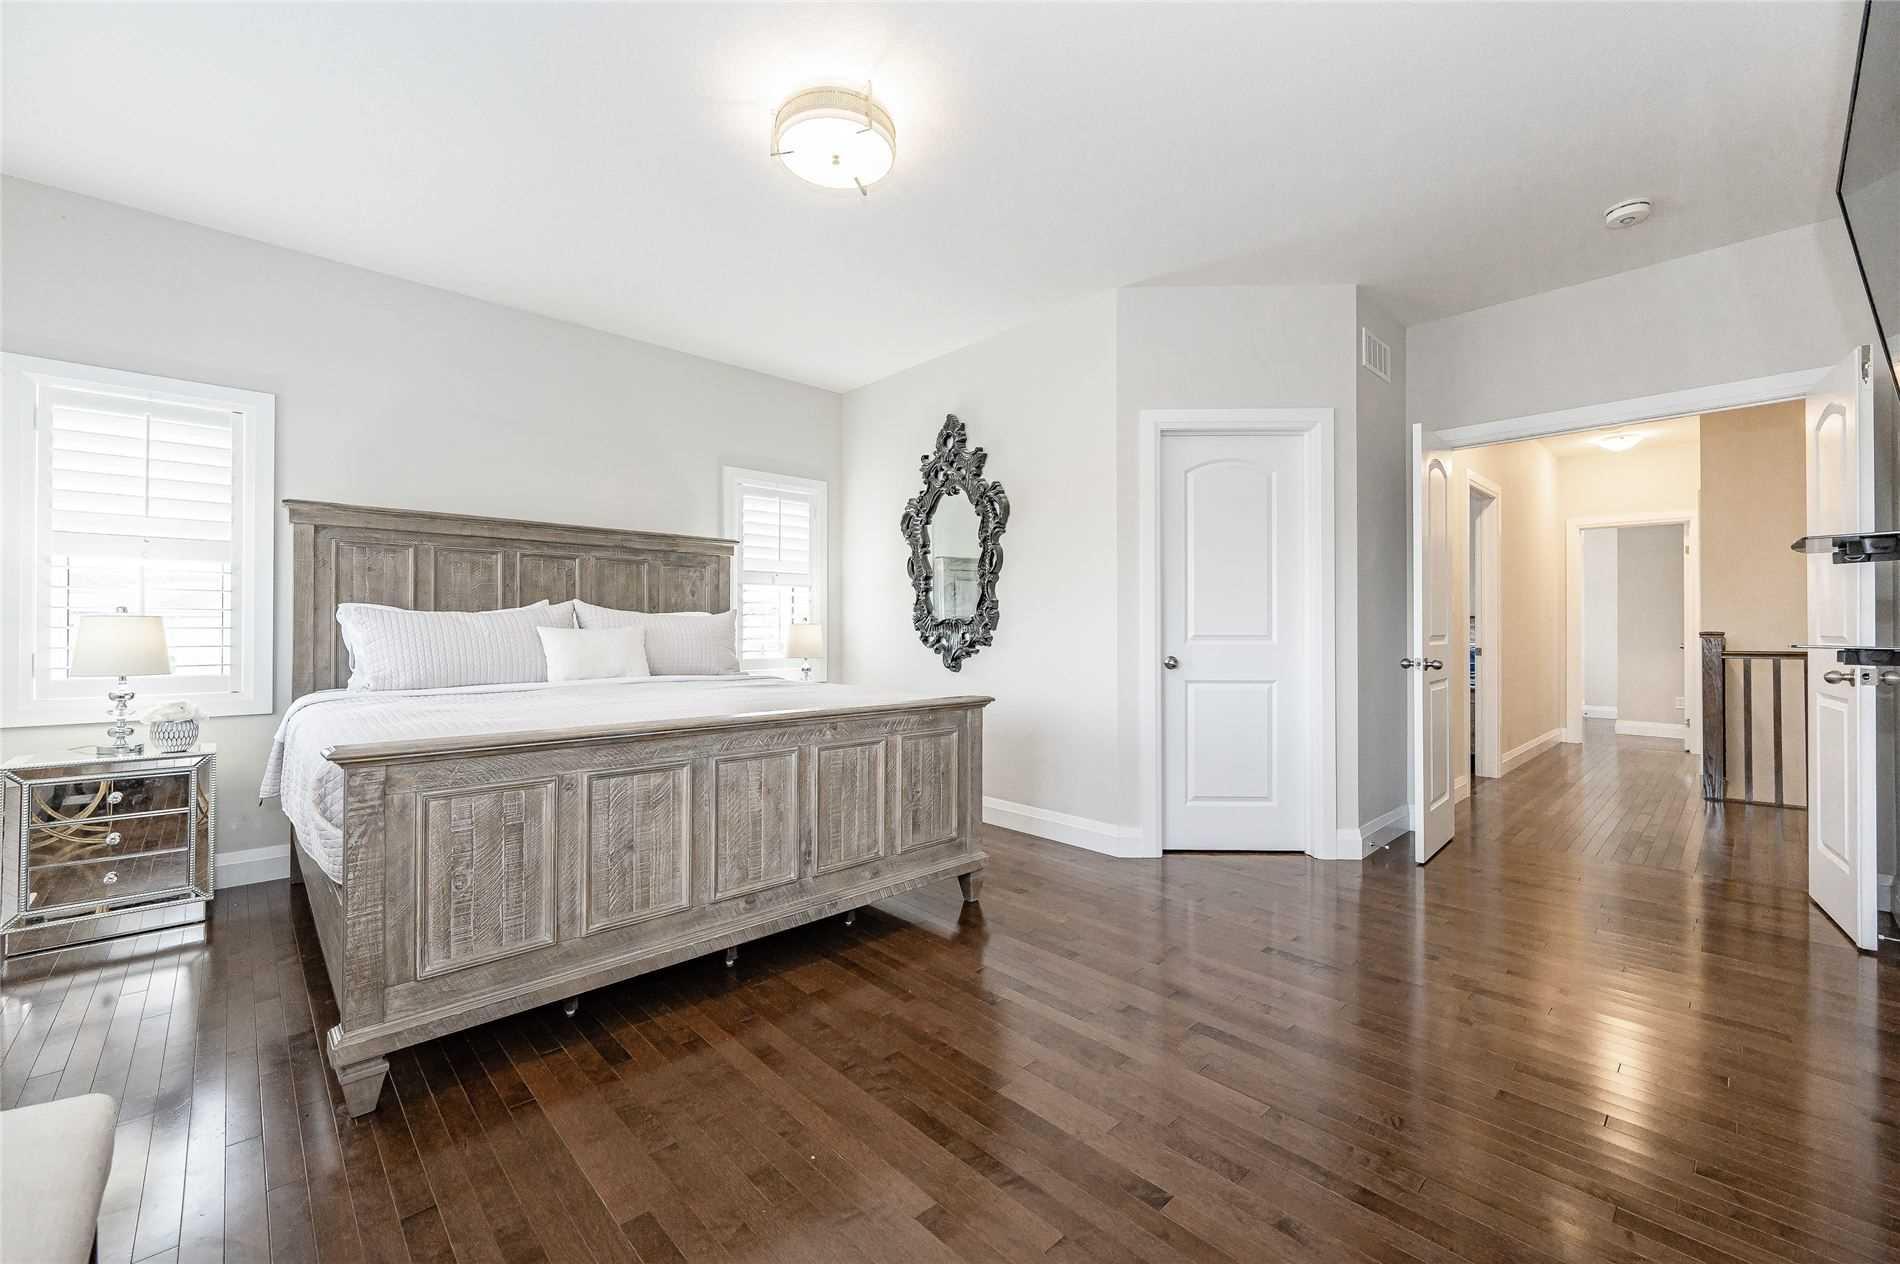 2 Parkvale Dr, Kitchener, Ontario N2R 1R1, 4 Bedrooms Bedrooms, 12 Rooms Rooms,4 BathroomsBathrooms,Detached,For Sale,Parkvale,X5354110